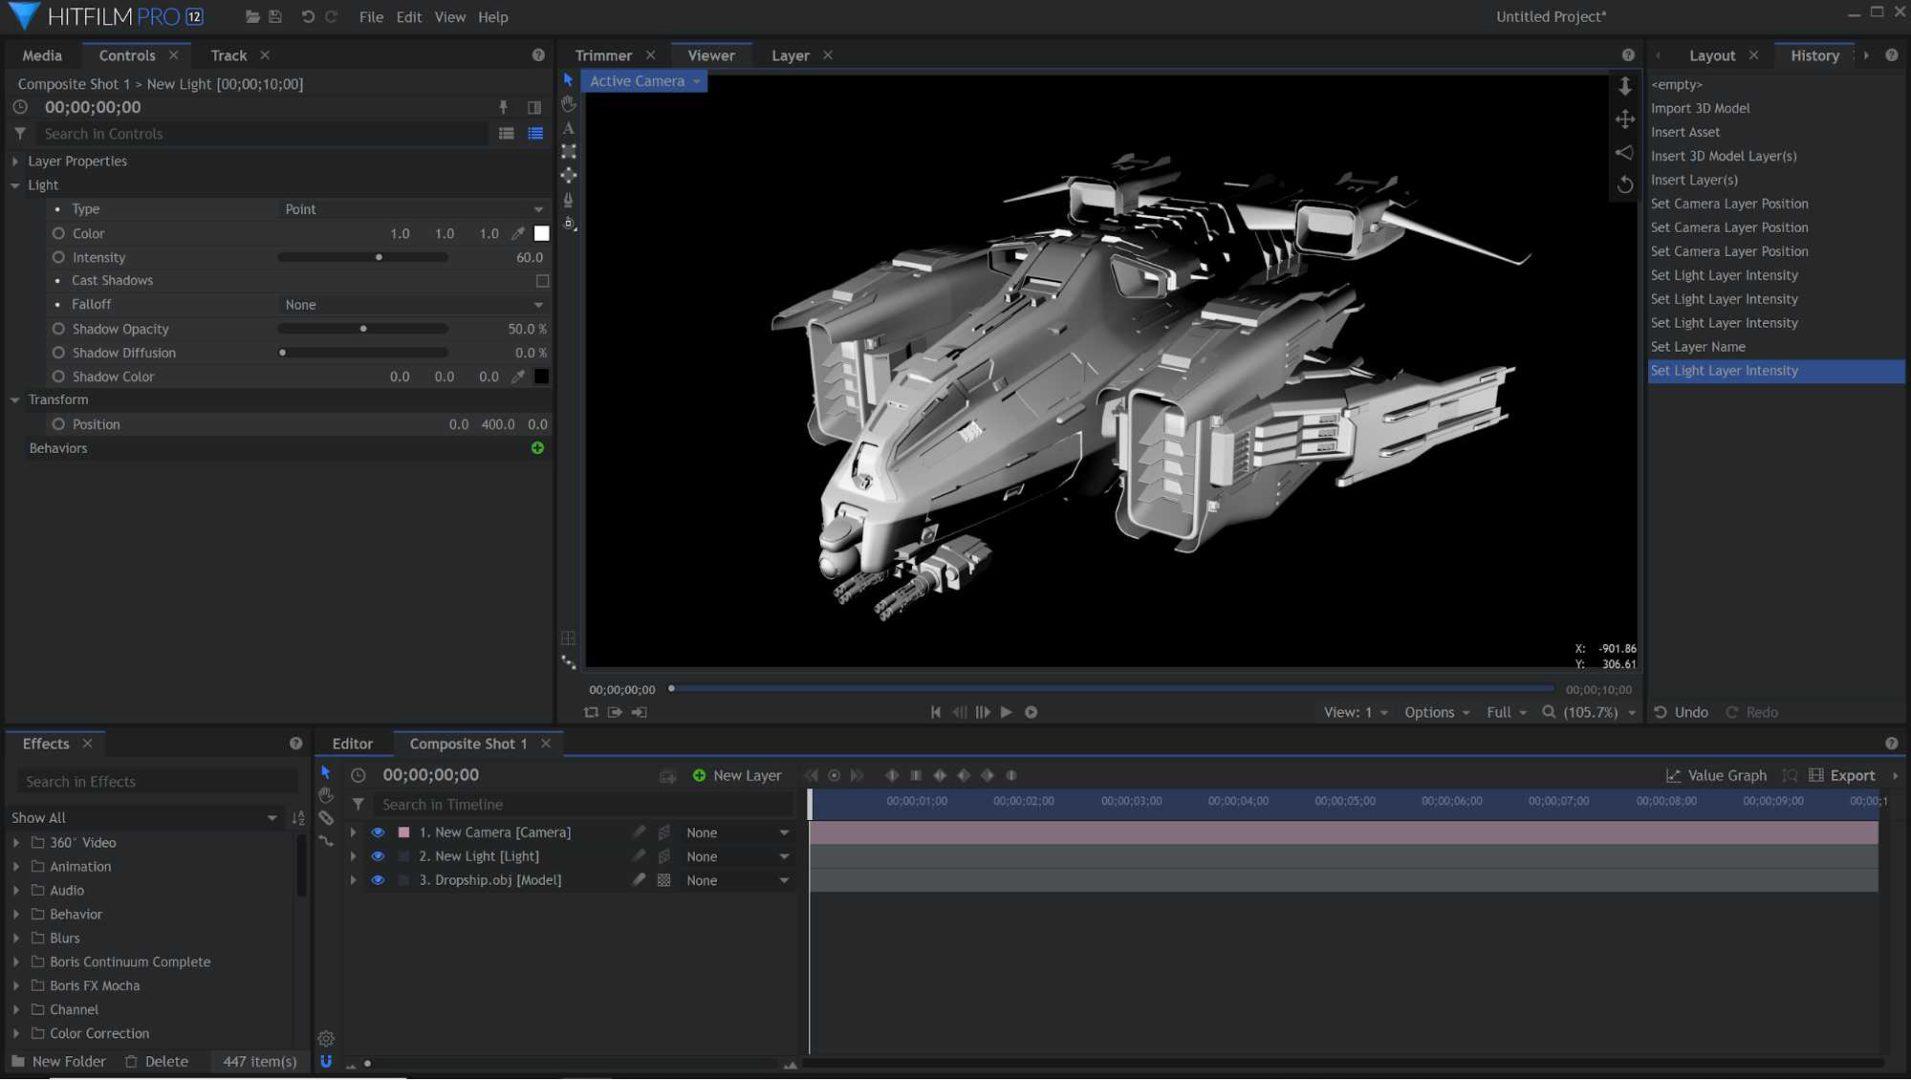 3D model in HitFilm Pro